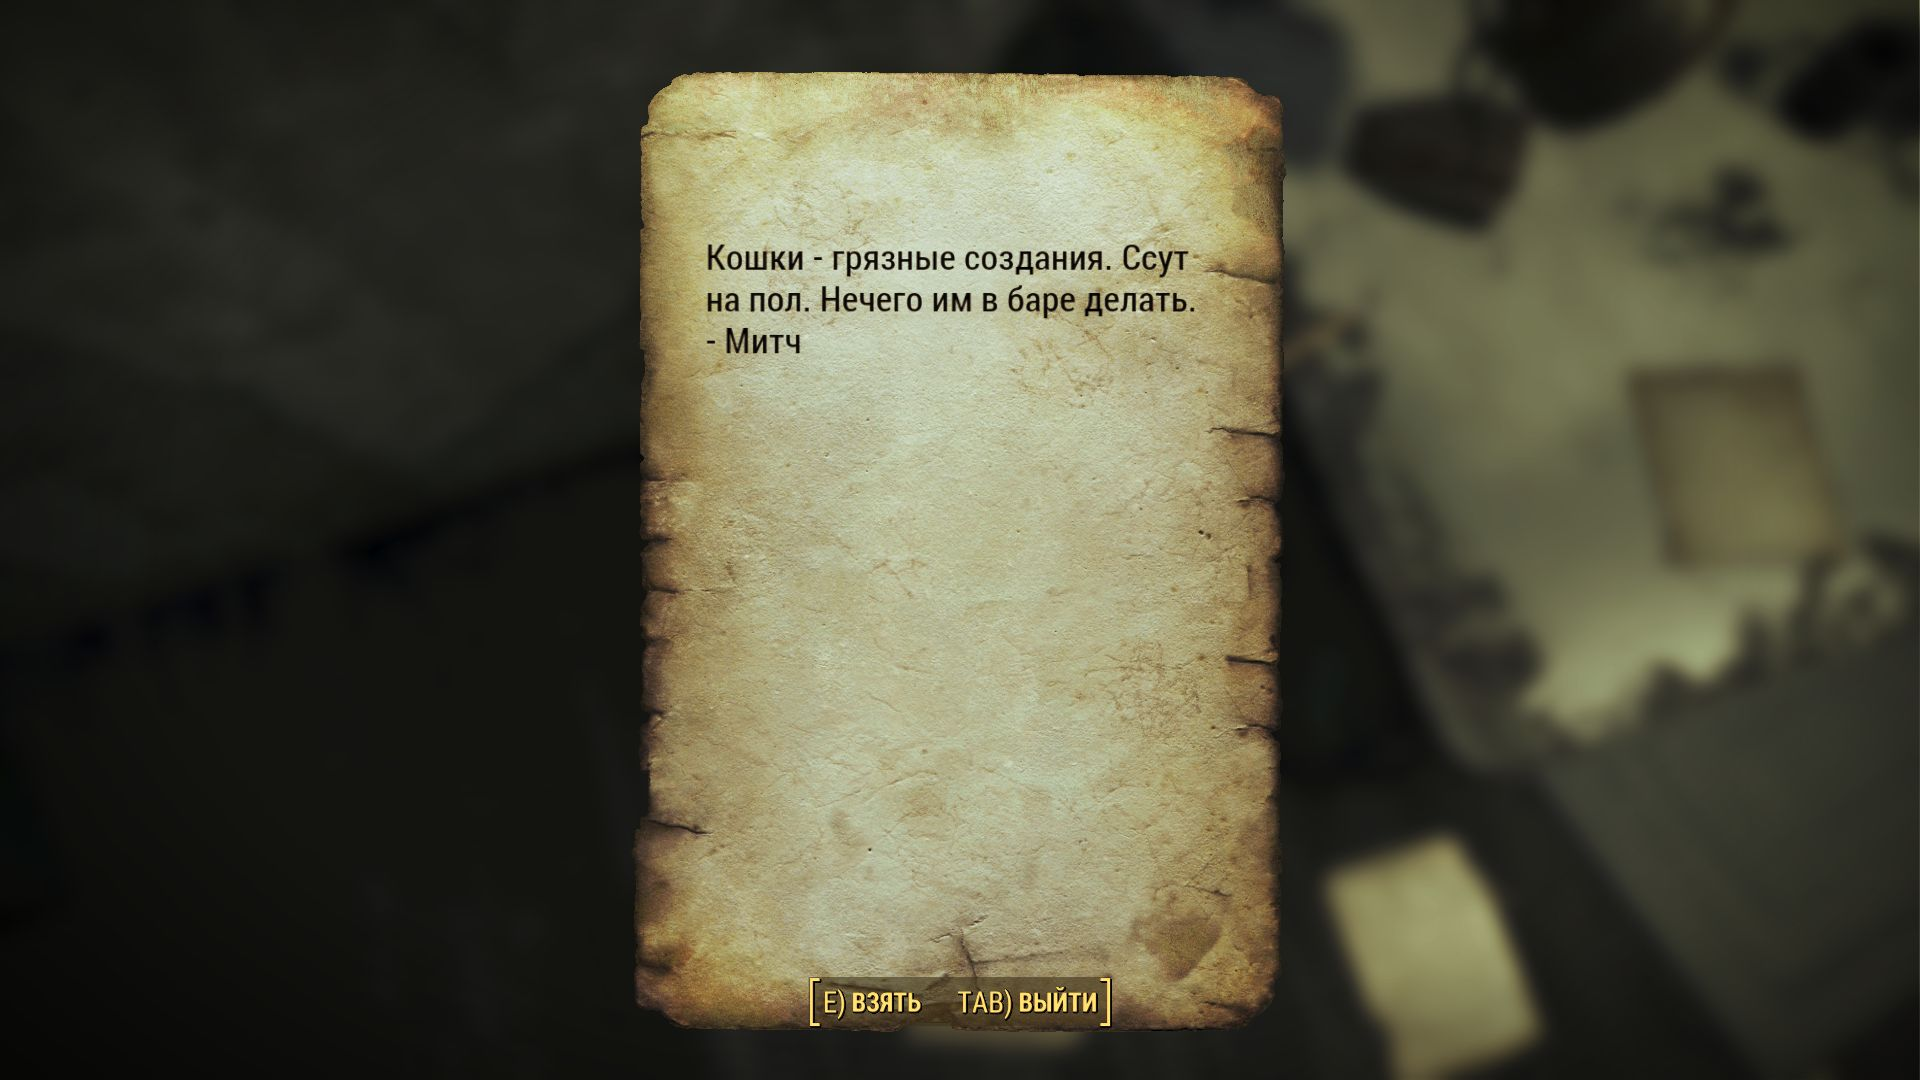 Митч о кошках - Fallout 4 бармен, кошки, Митч